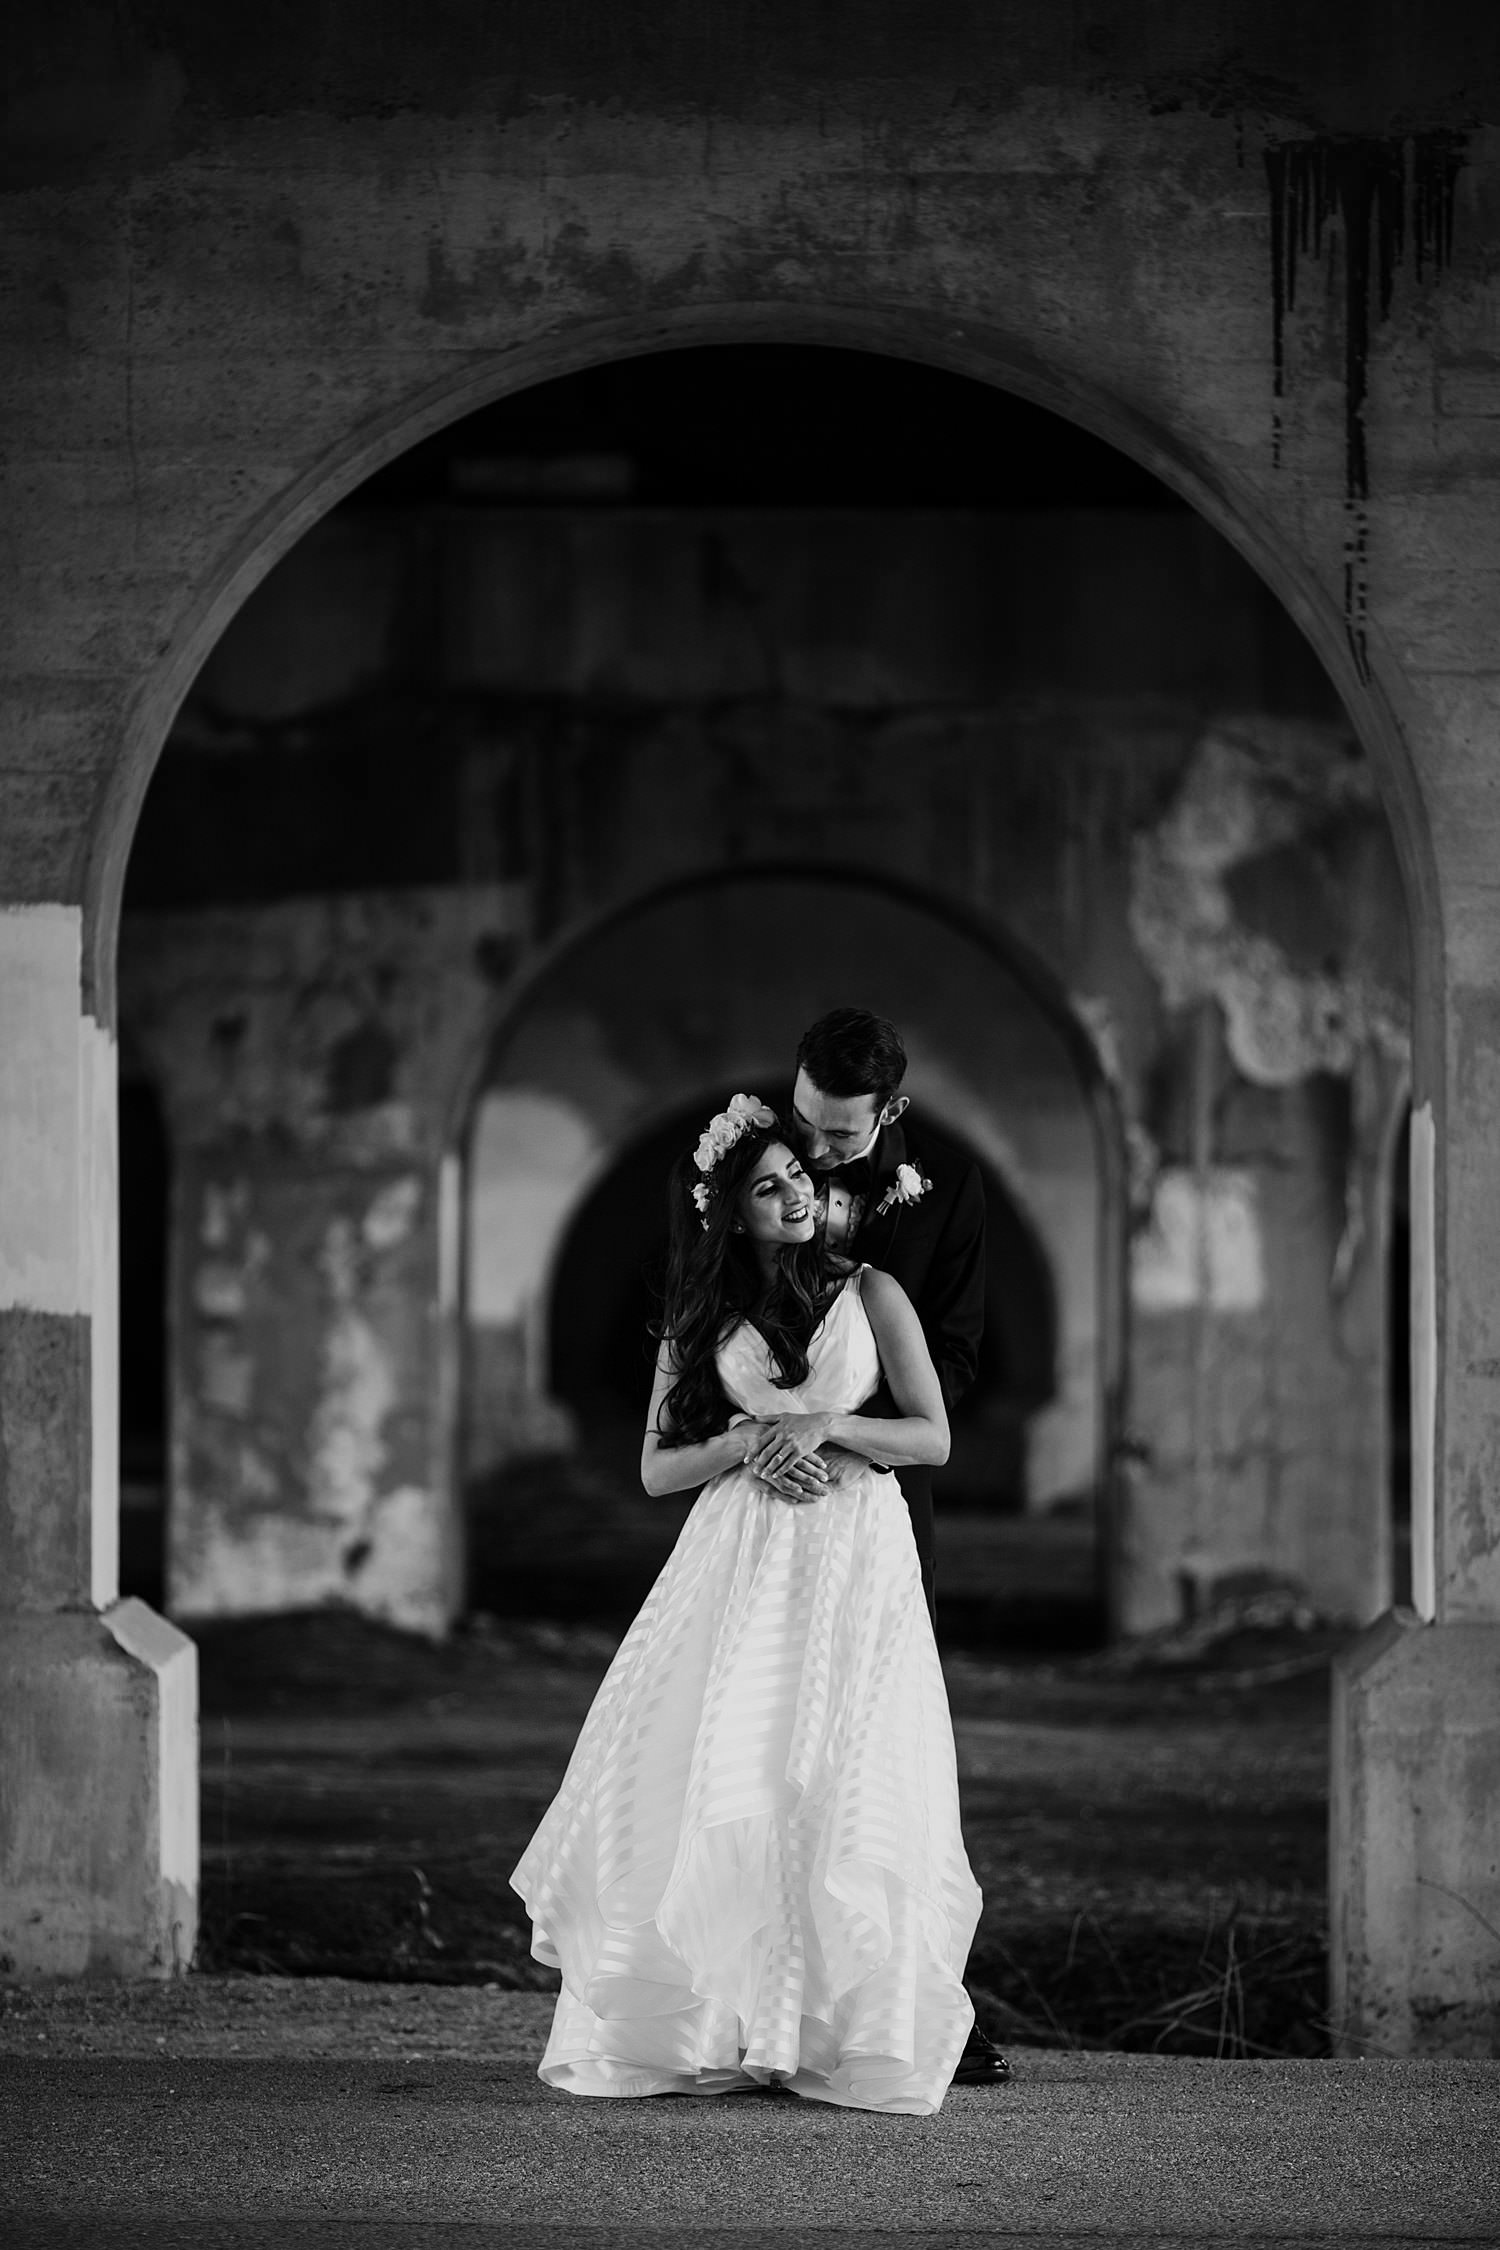 mt-washington-mill-dye-house-wedding-photos-500.JPG